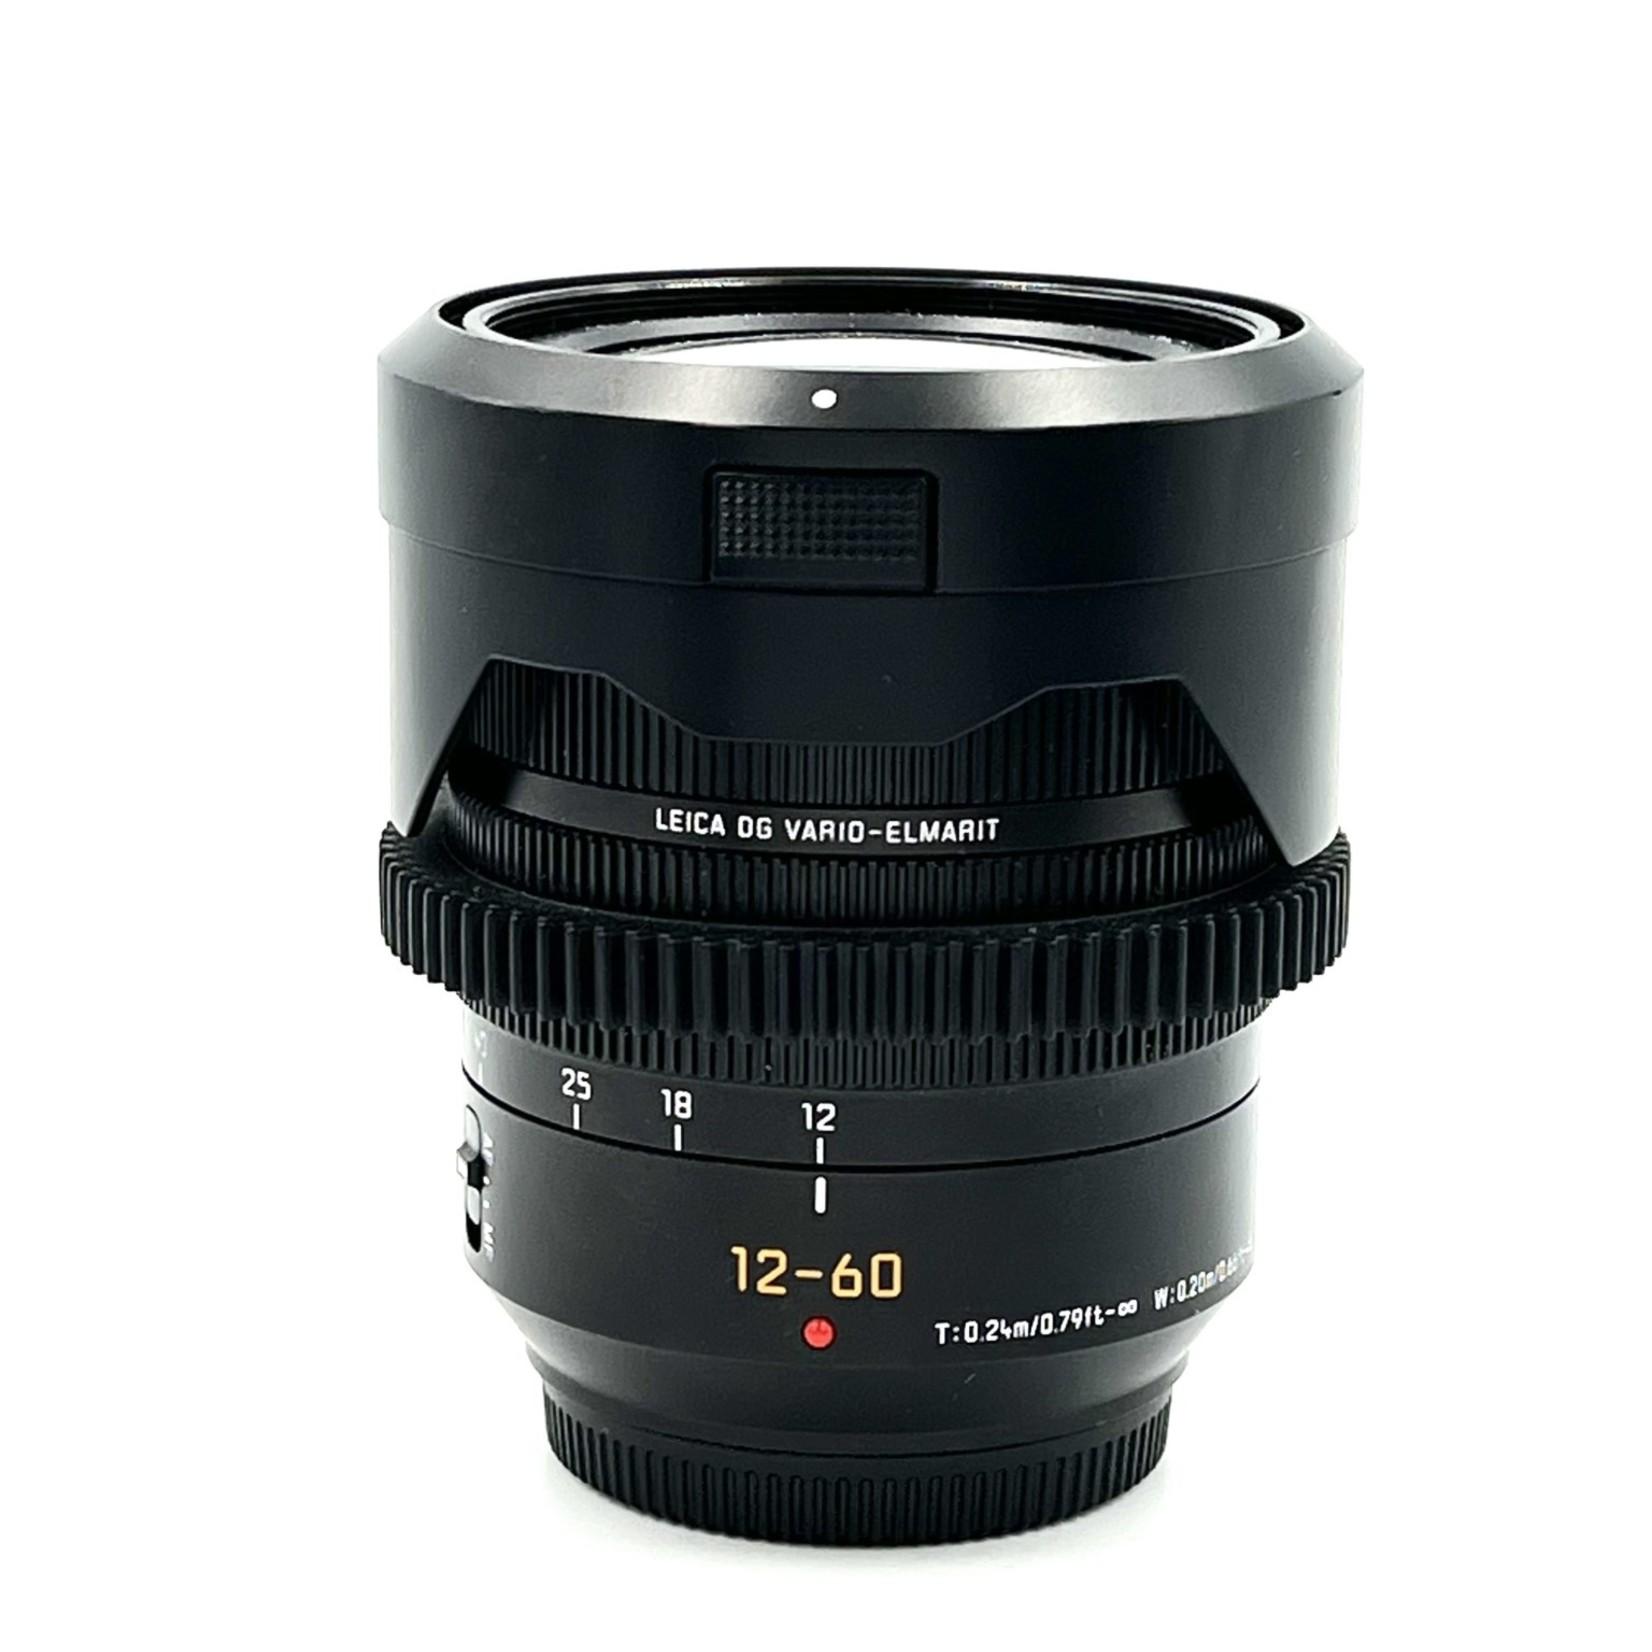 Panasonic PanaSonic Leica DG Vario-Elmarit 12-60mm F2.8-4